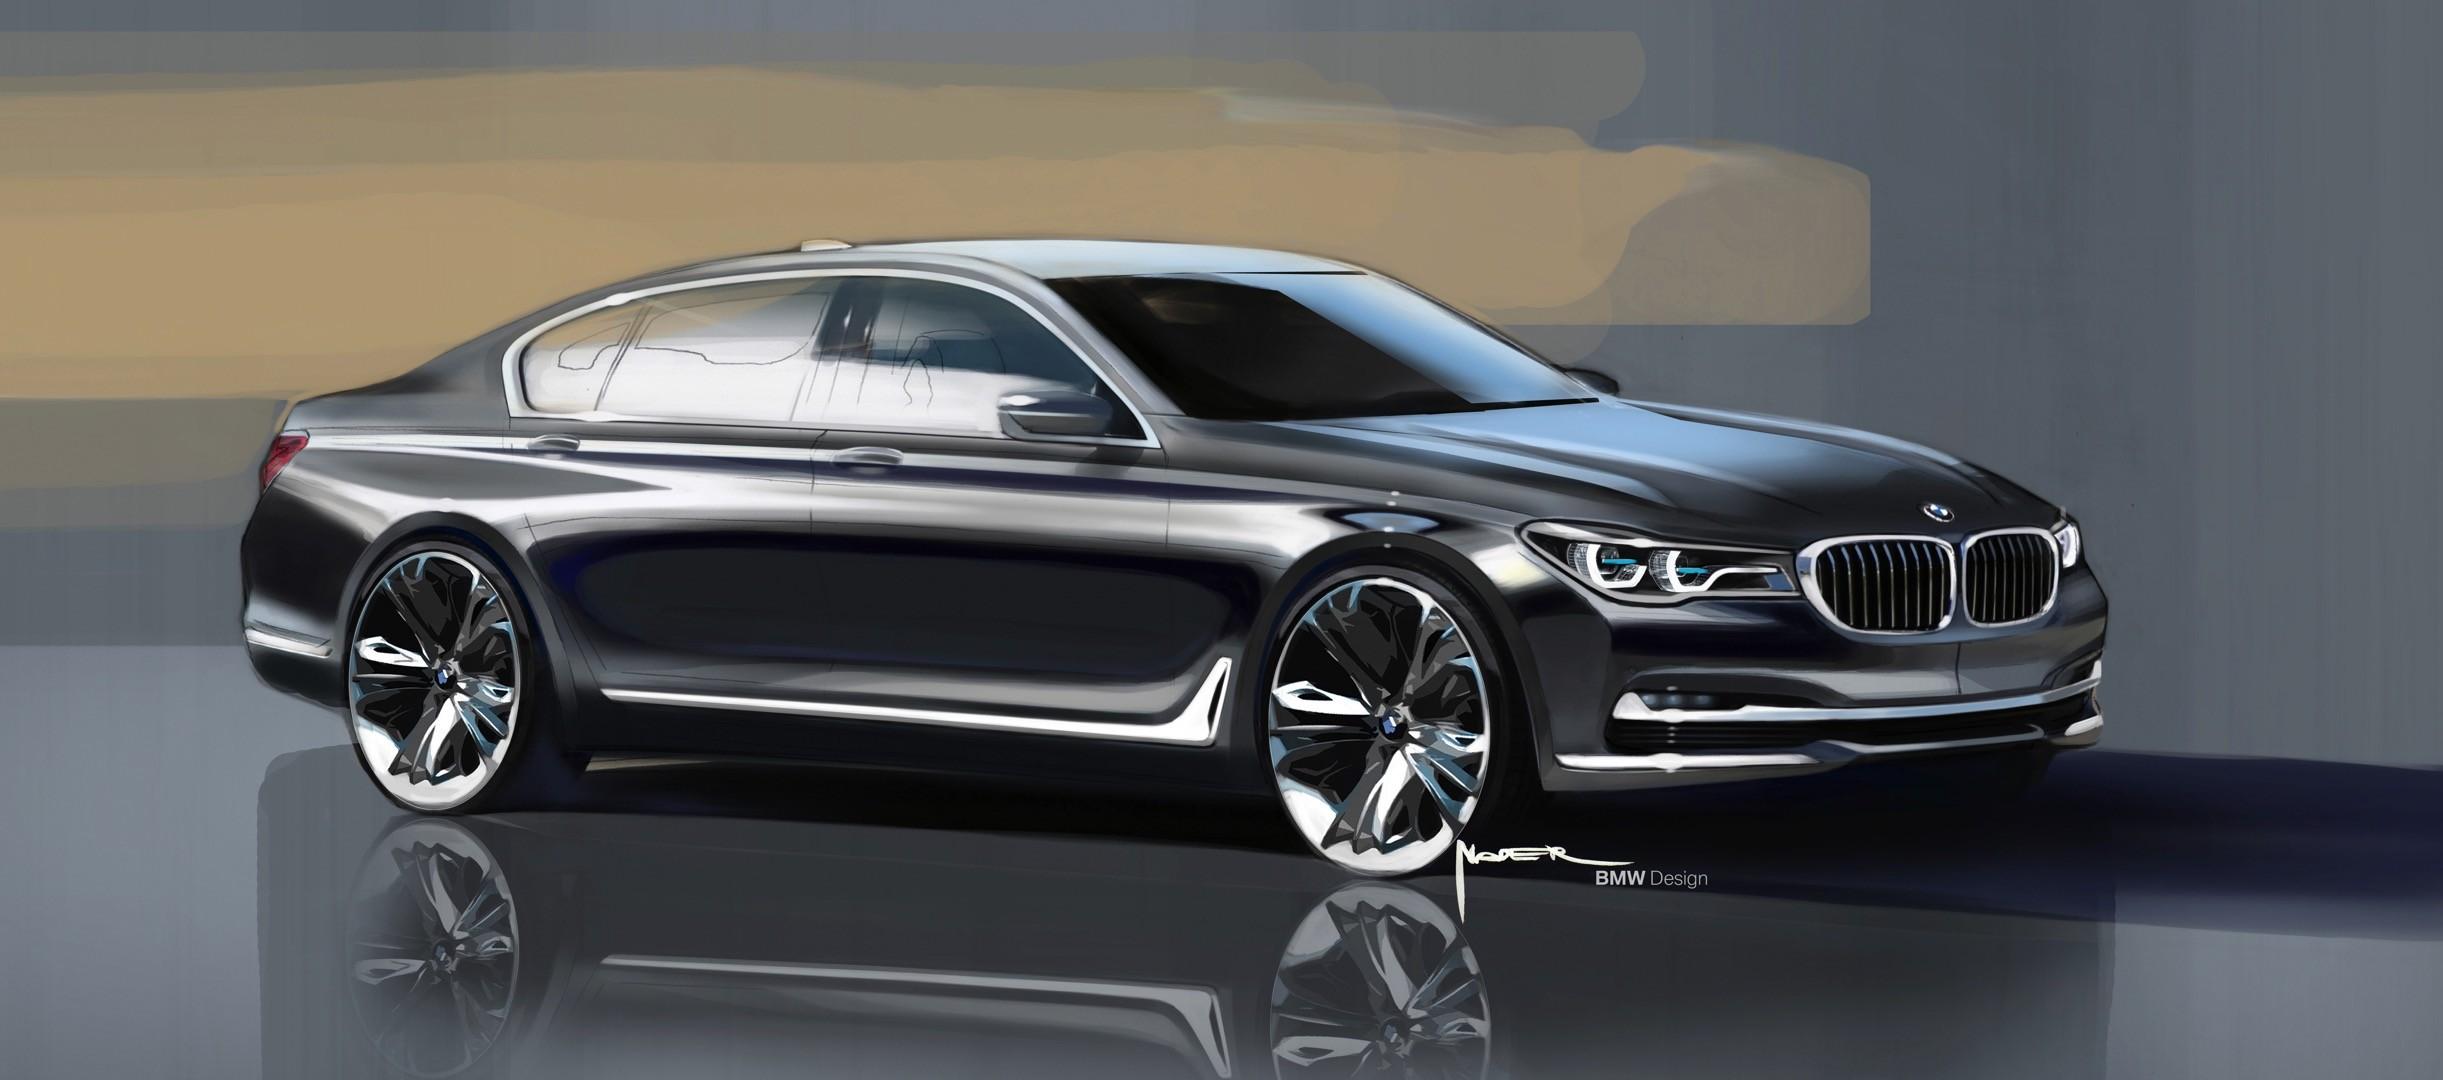 Bmw 7 Series G11 G12 2016 Autoevolution